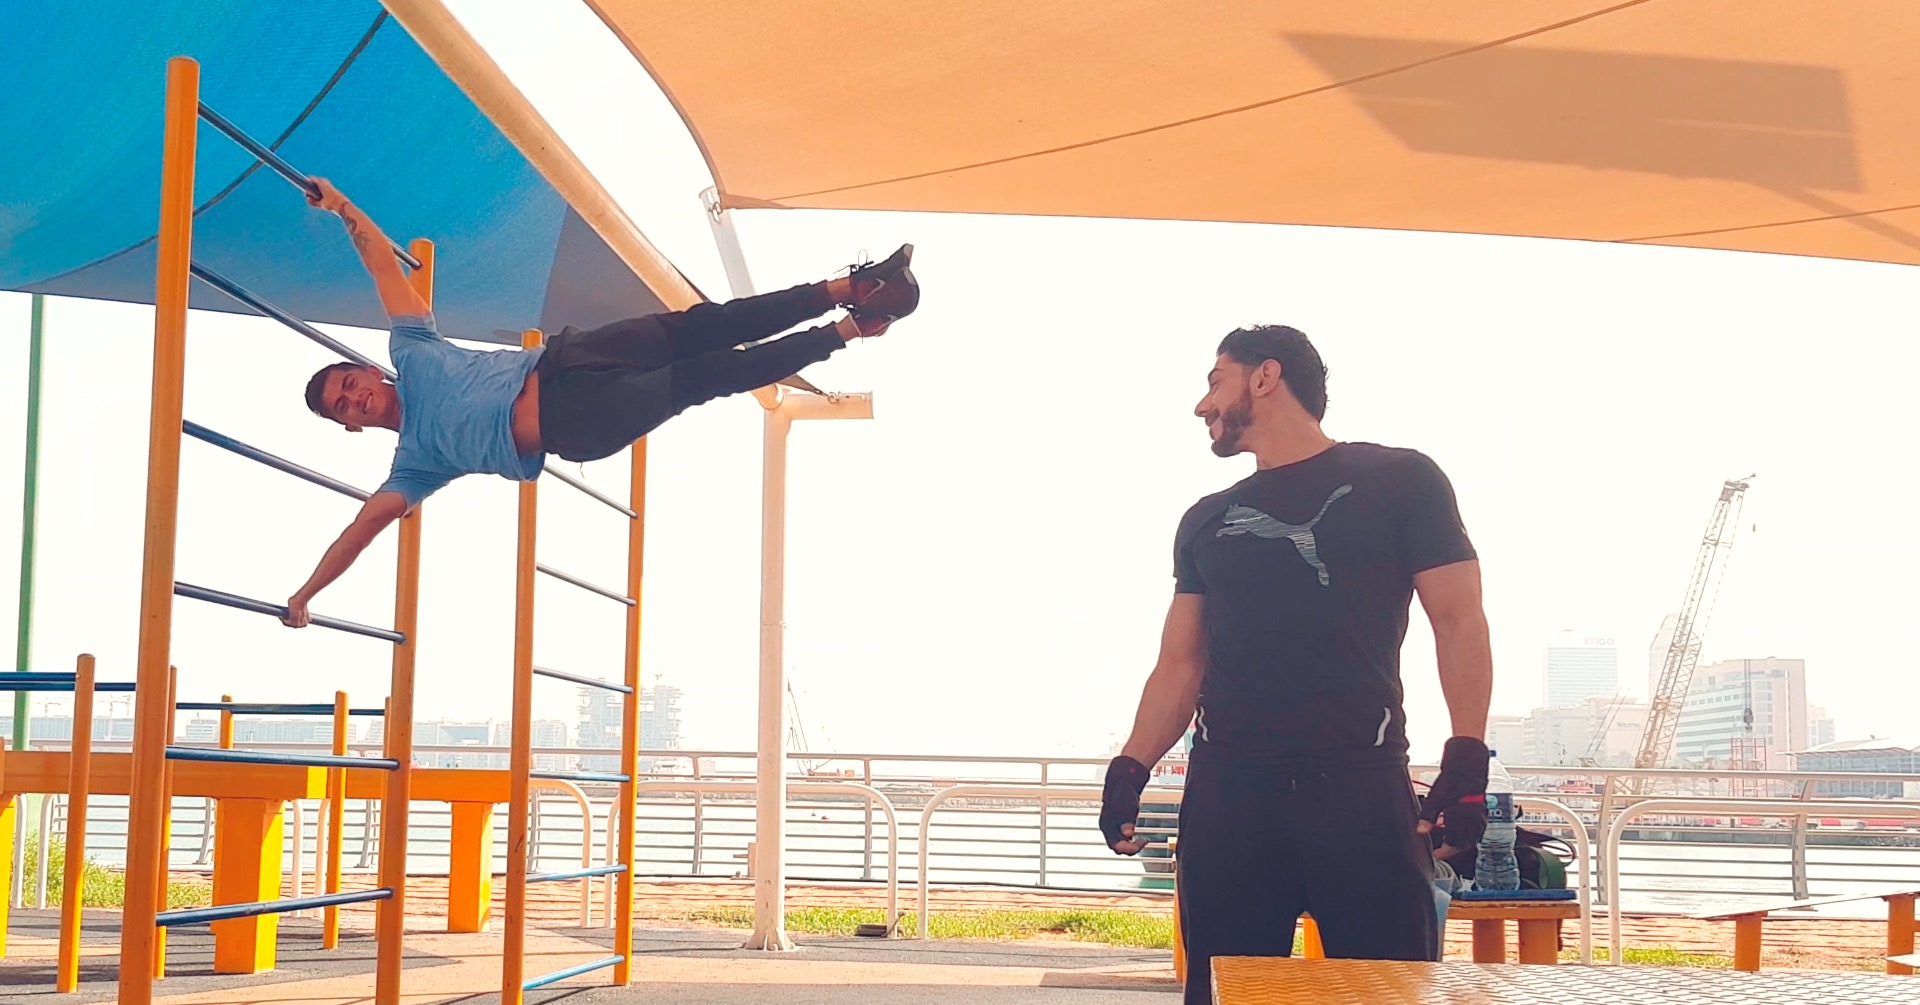 dubai-fitness-60 second spotlight - 3